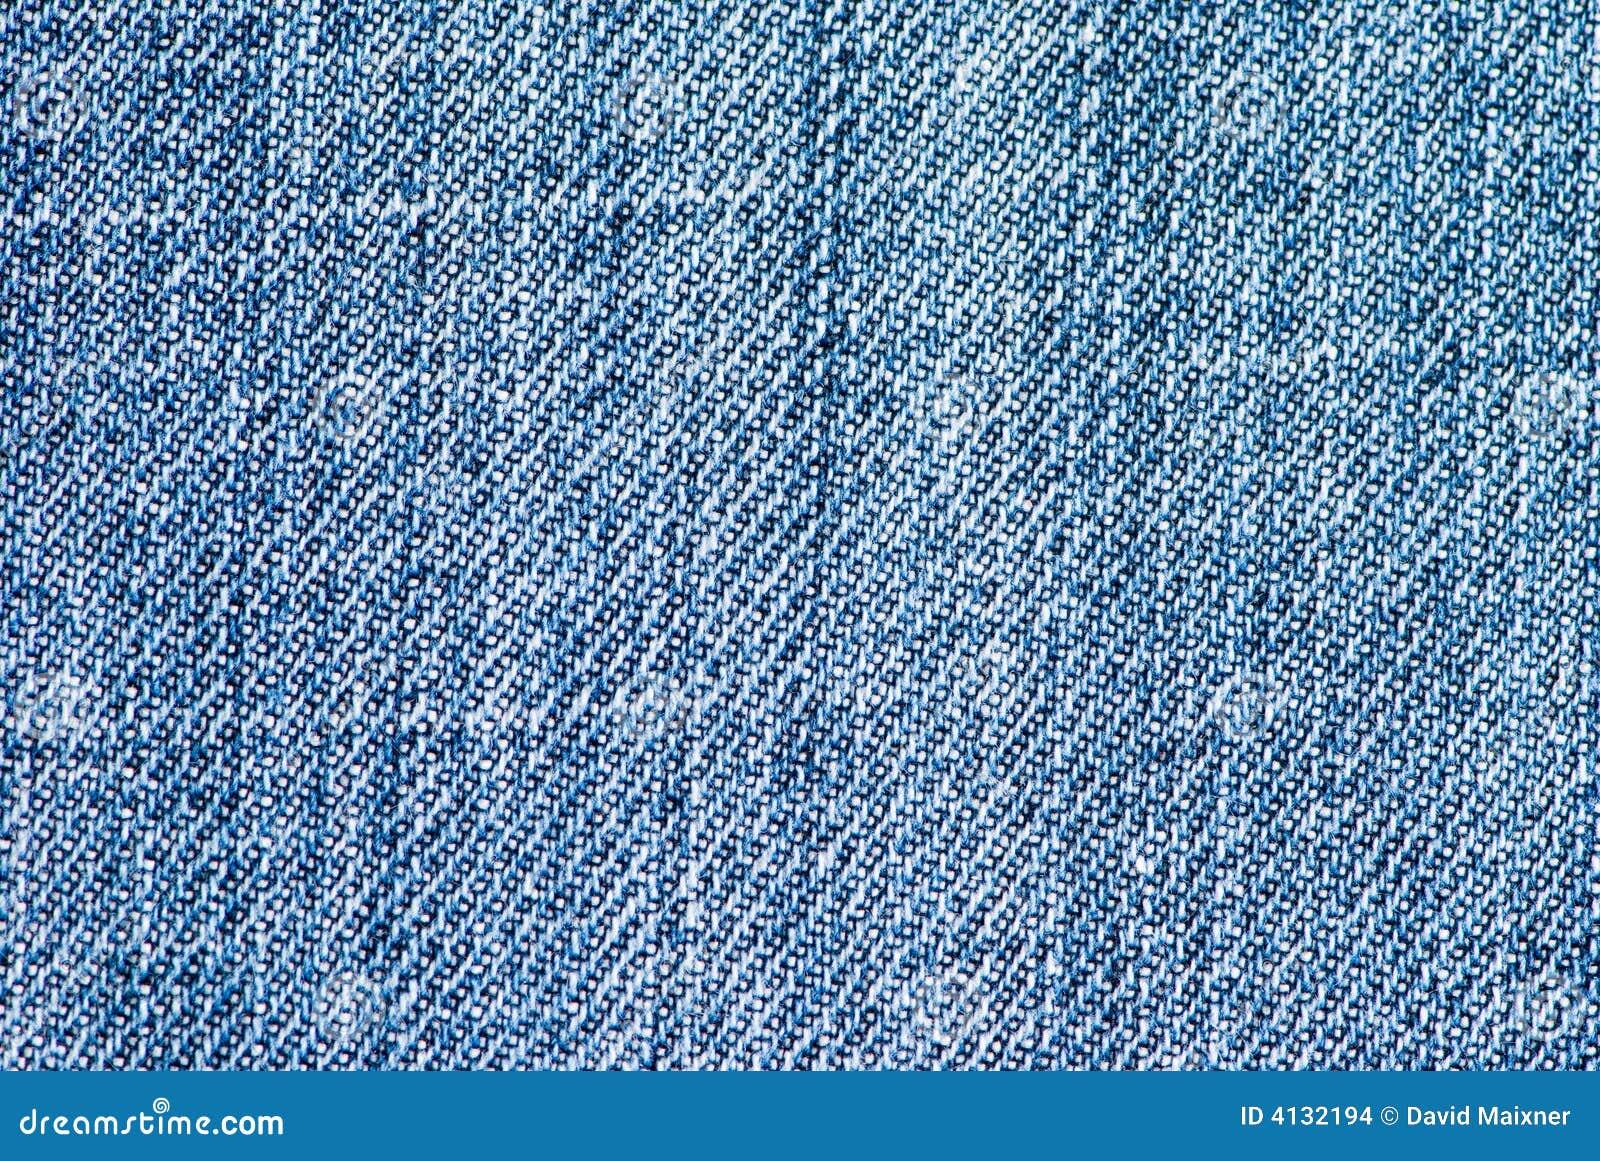 Blue jean baby - 1 part 10